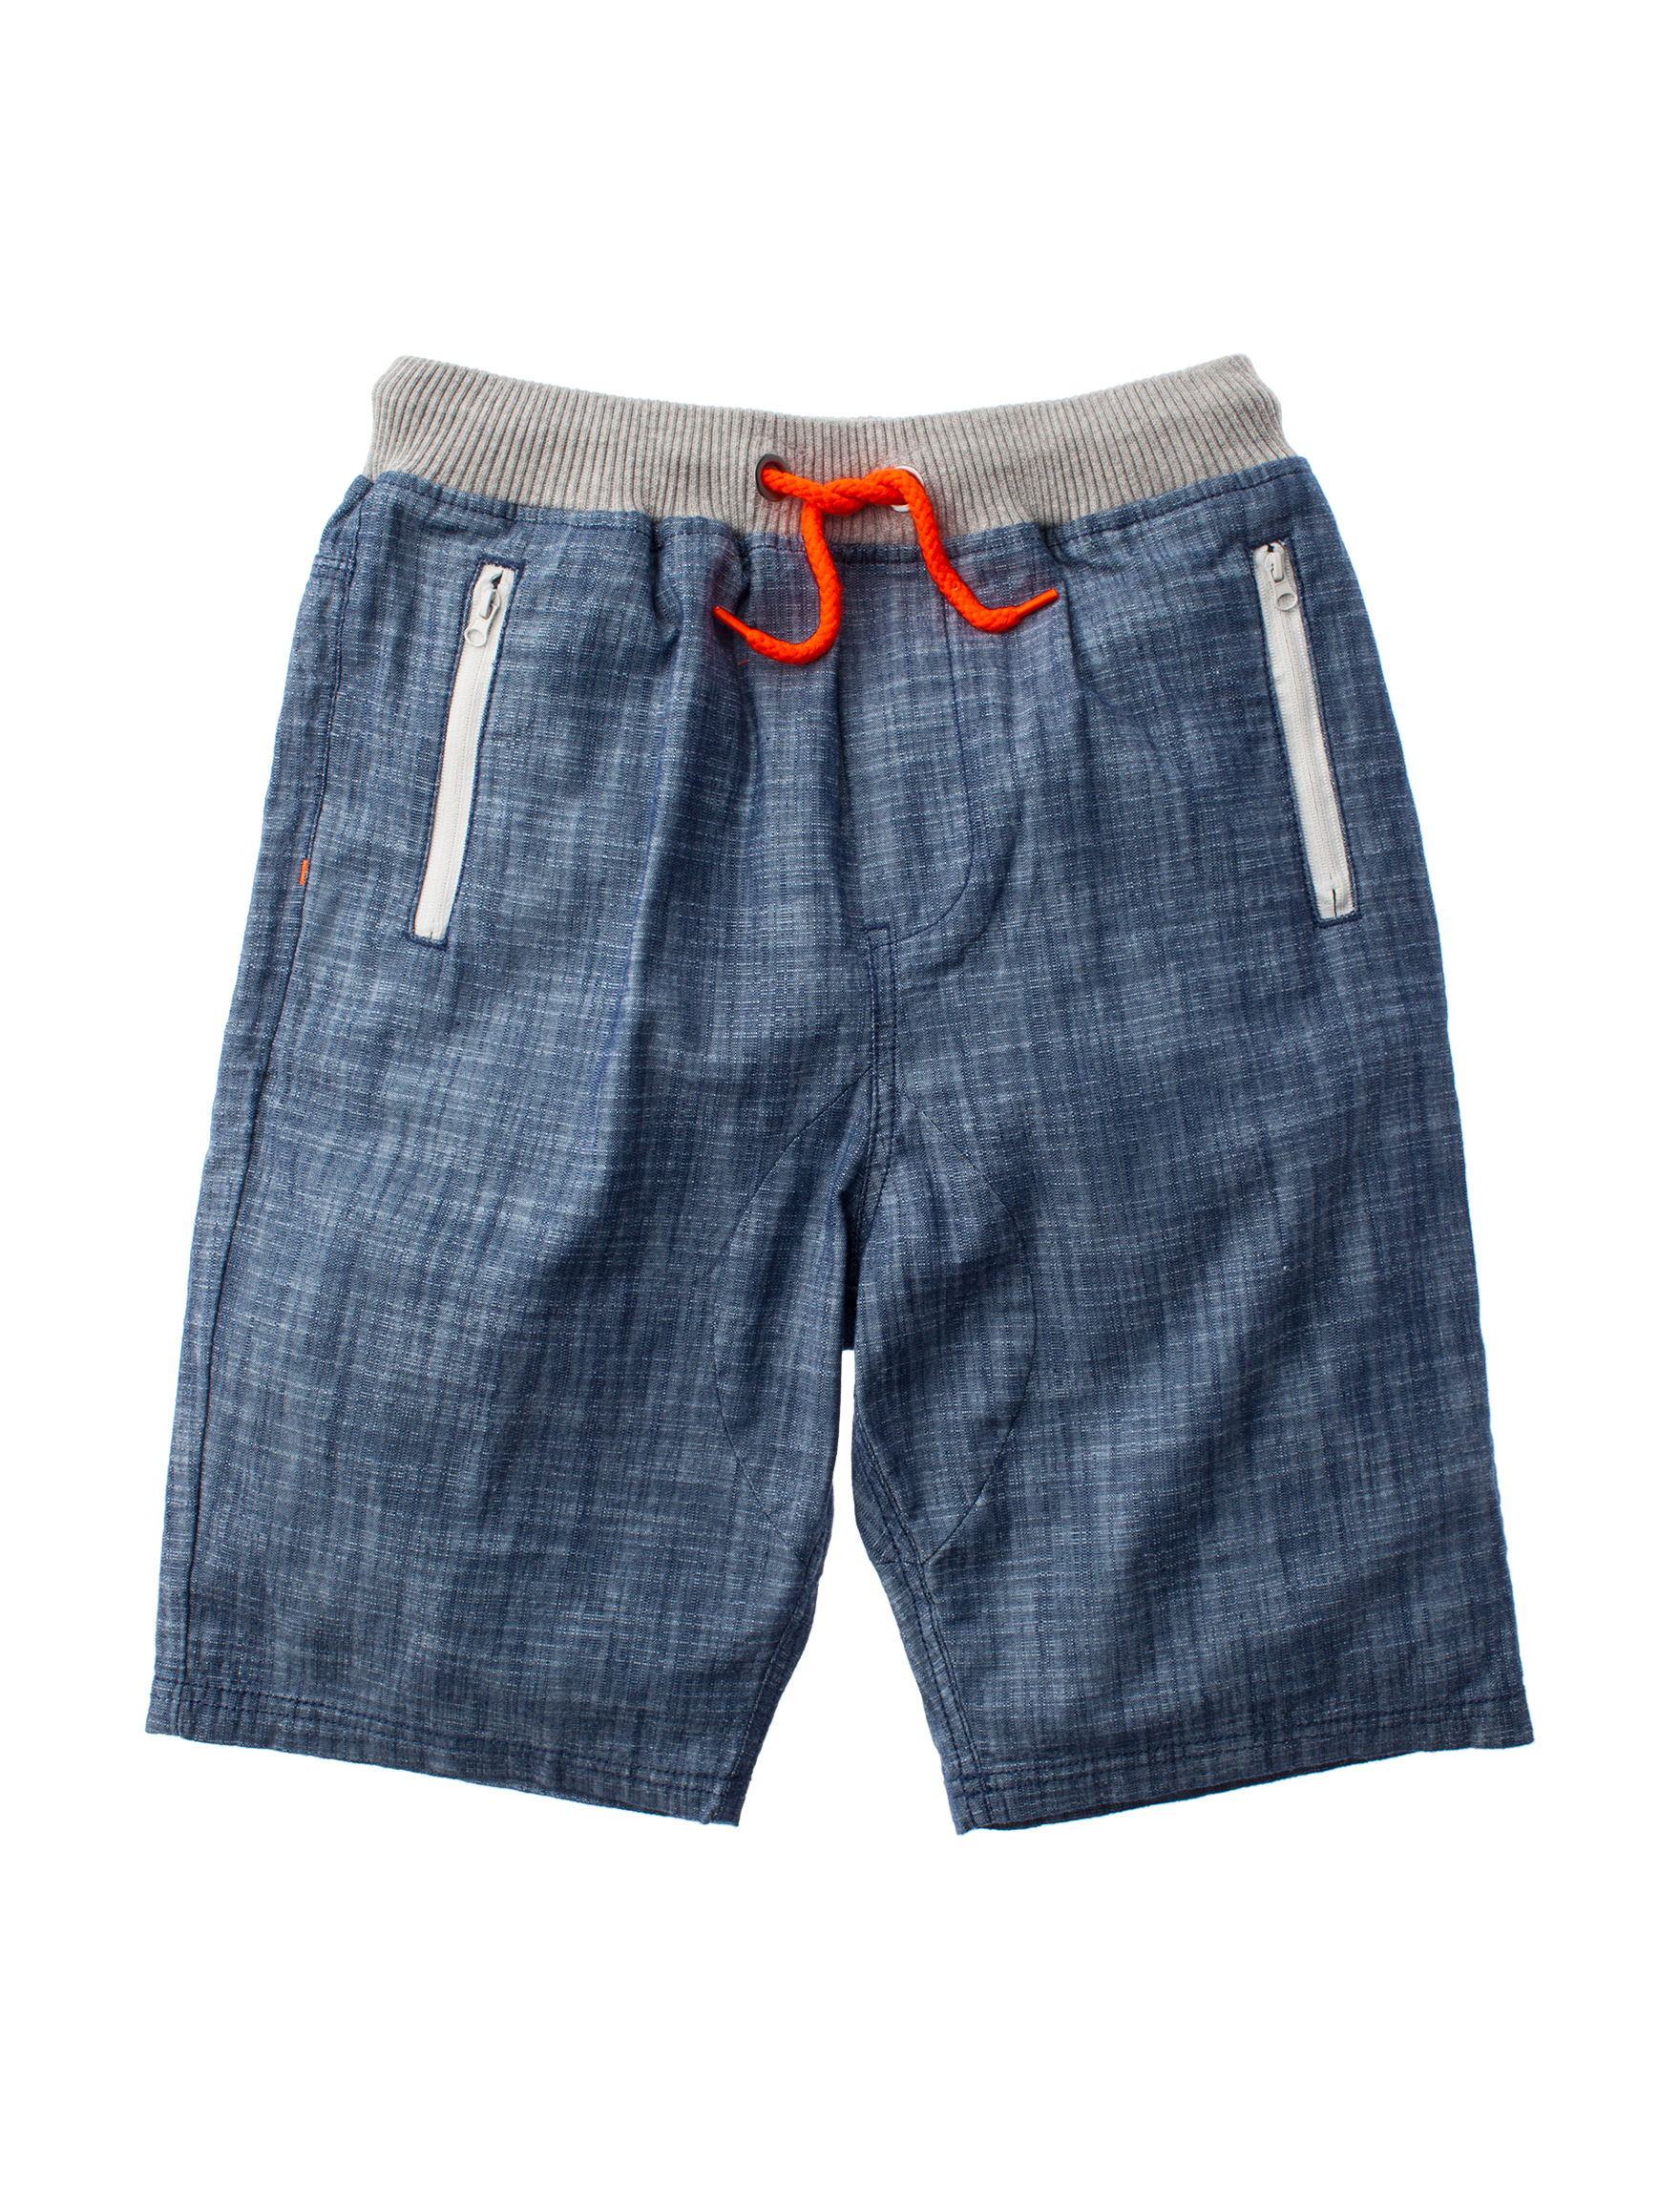 Rustic Blue Chambray Soft Shorts